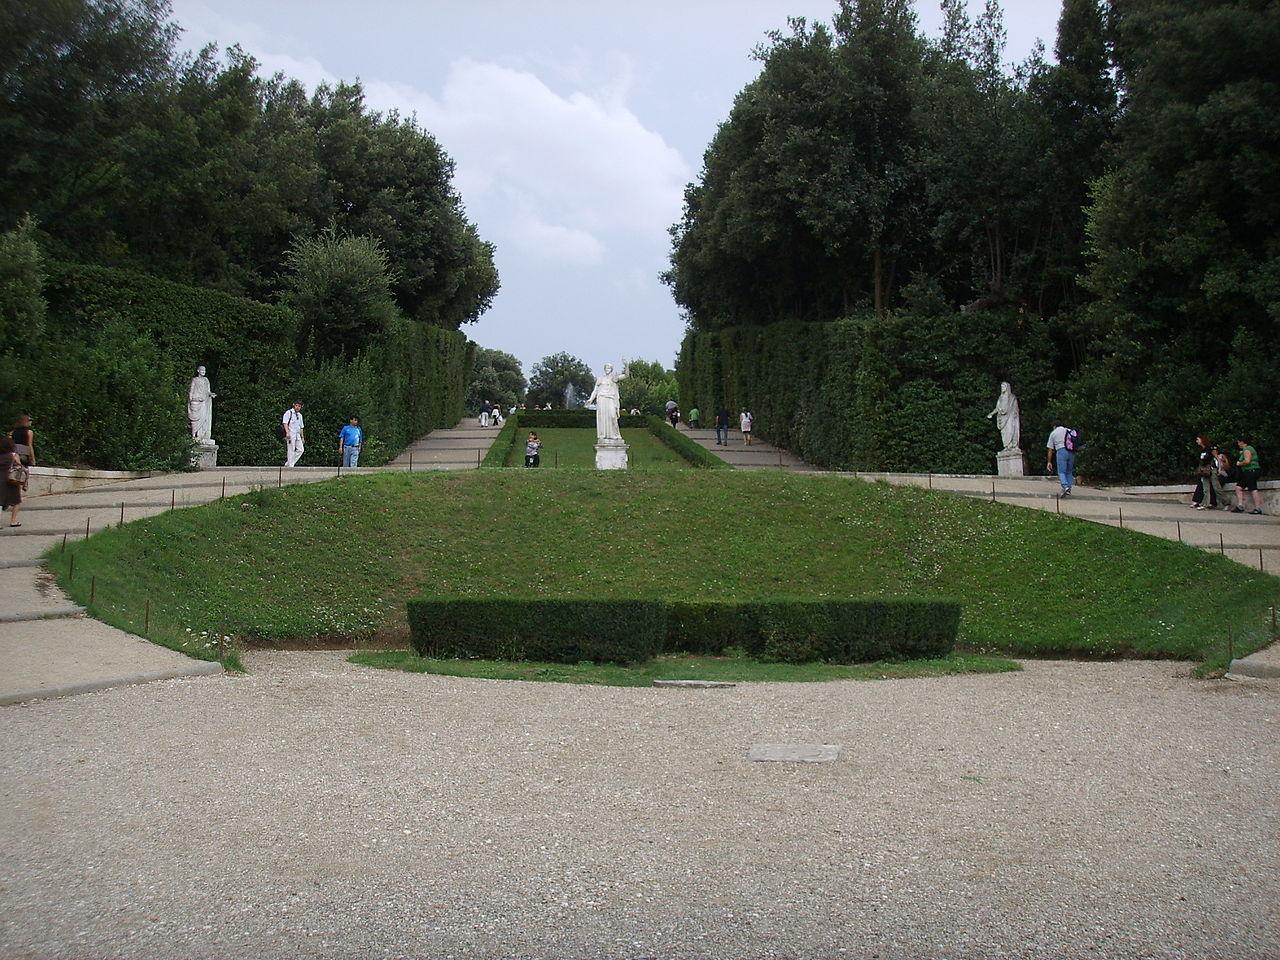 Сады Боболи, аллея и статуи